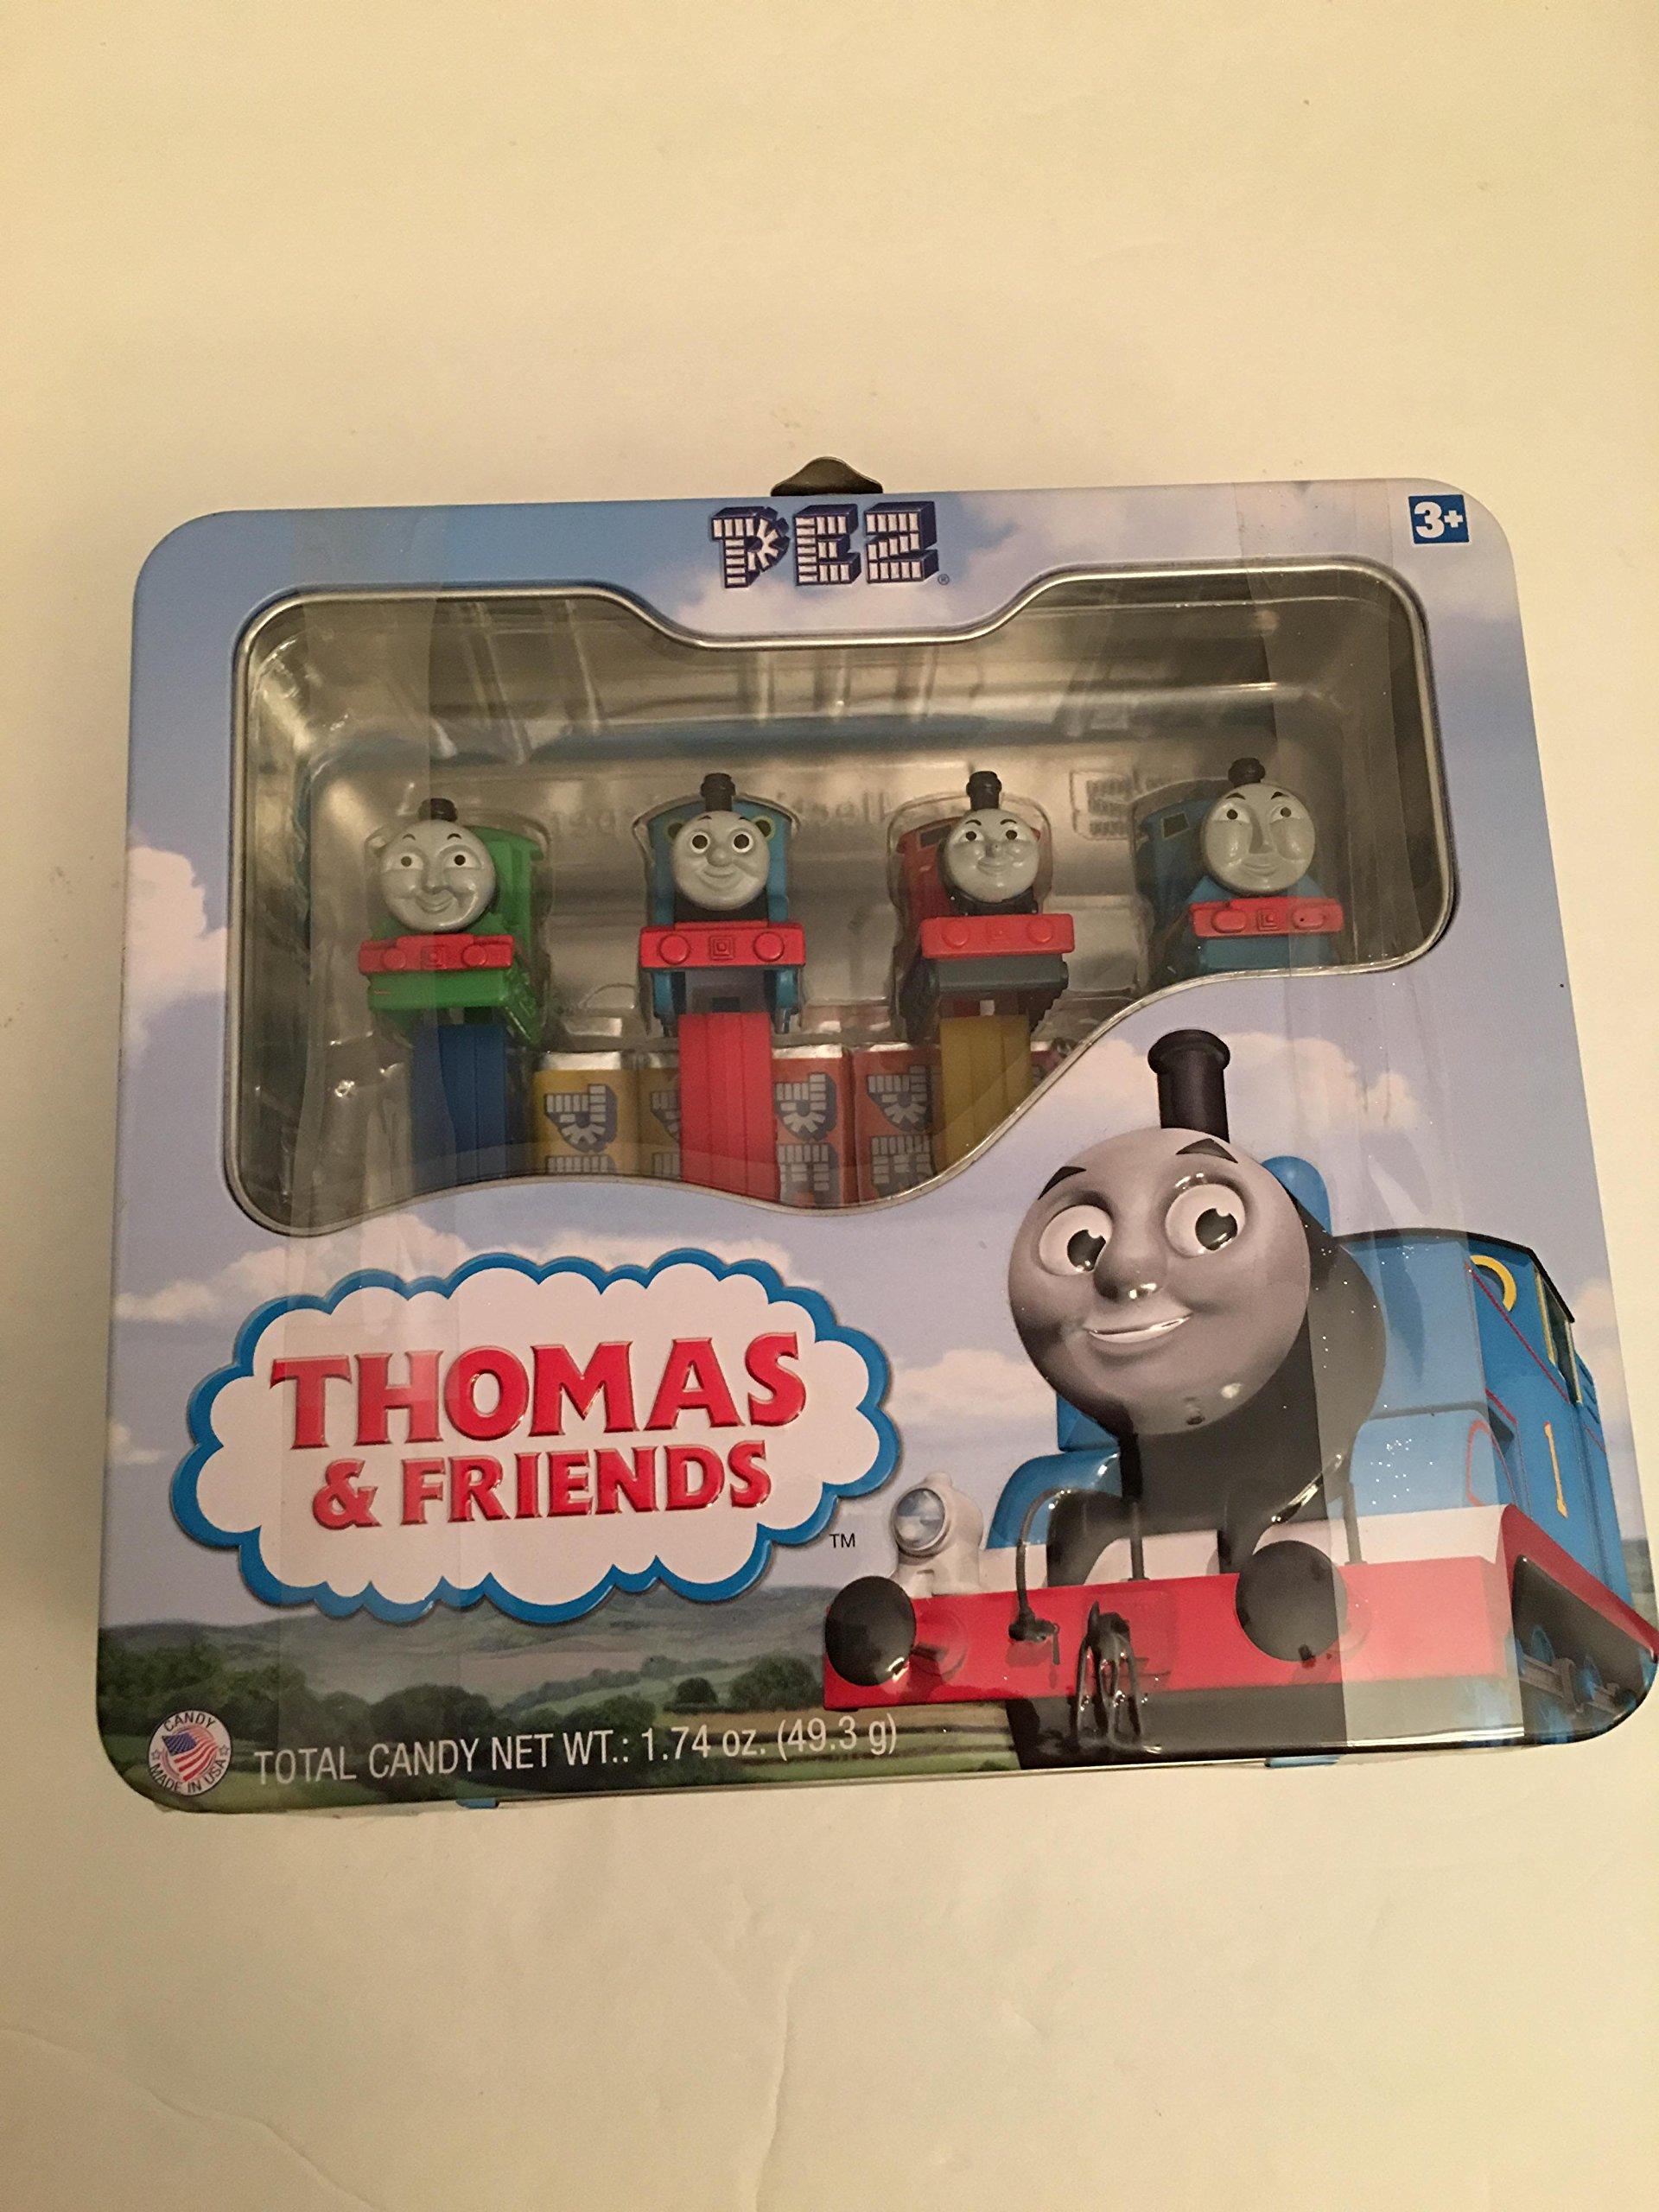 Thomas The Train Collectible Tin Tote Pez Candy Set by Pez